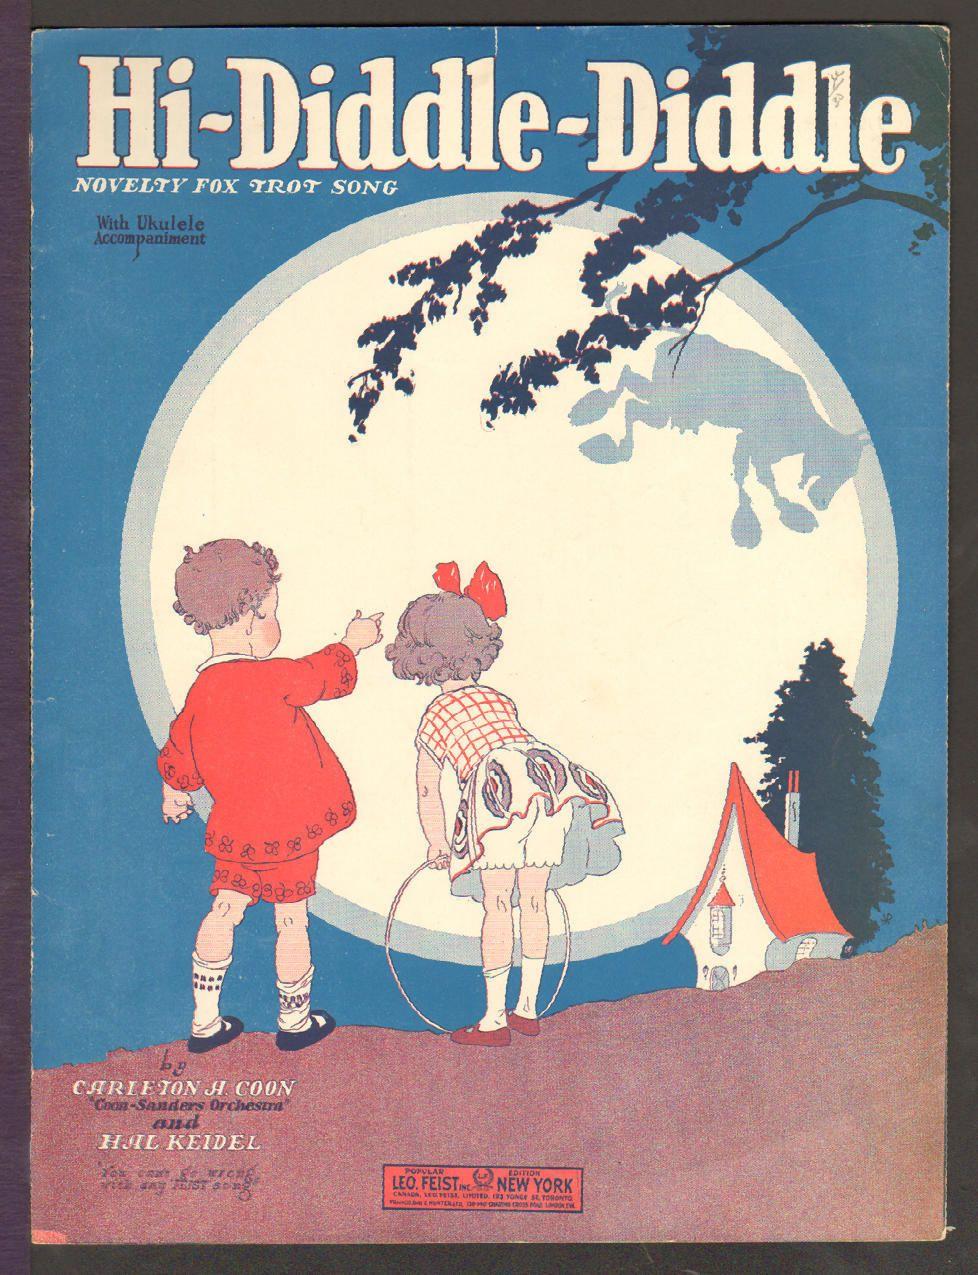 Hi Diddle Diddle 1926 Novelty Fox Trot Song Kids Vintage Sheet Music   eBay